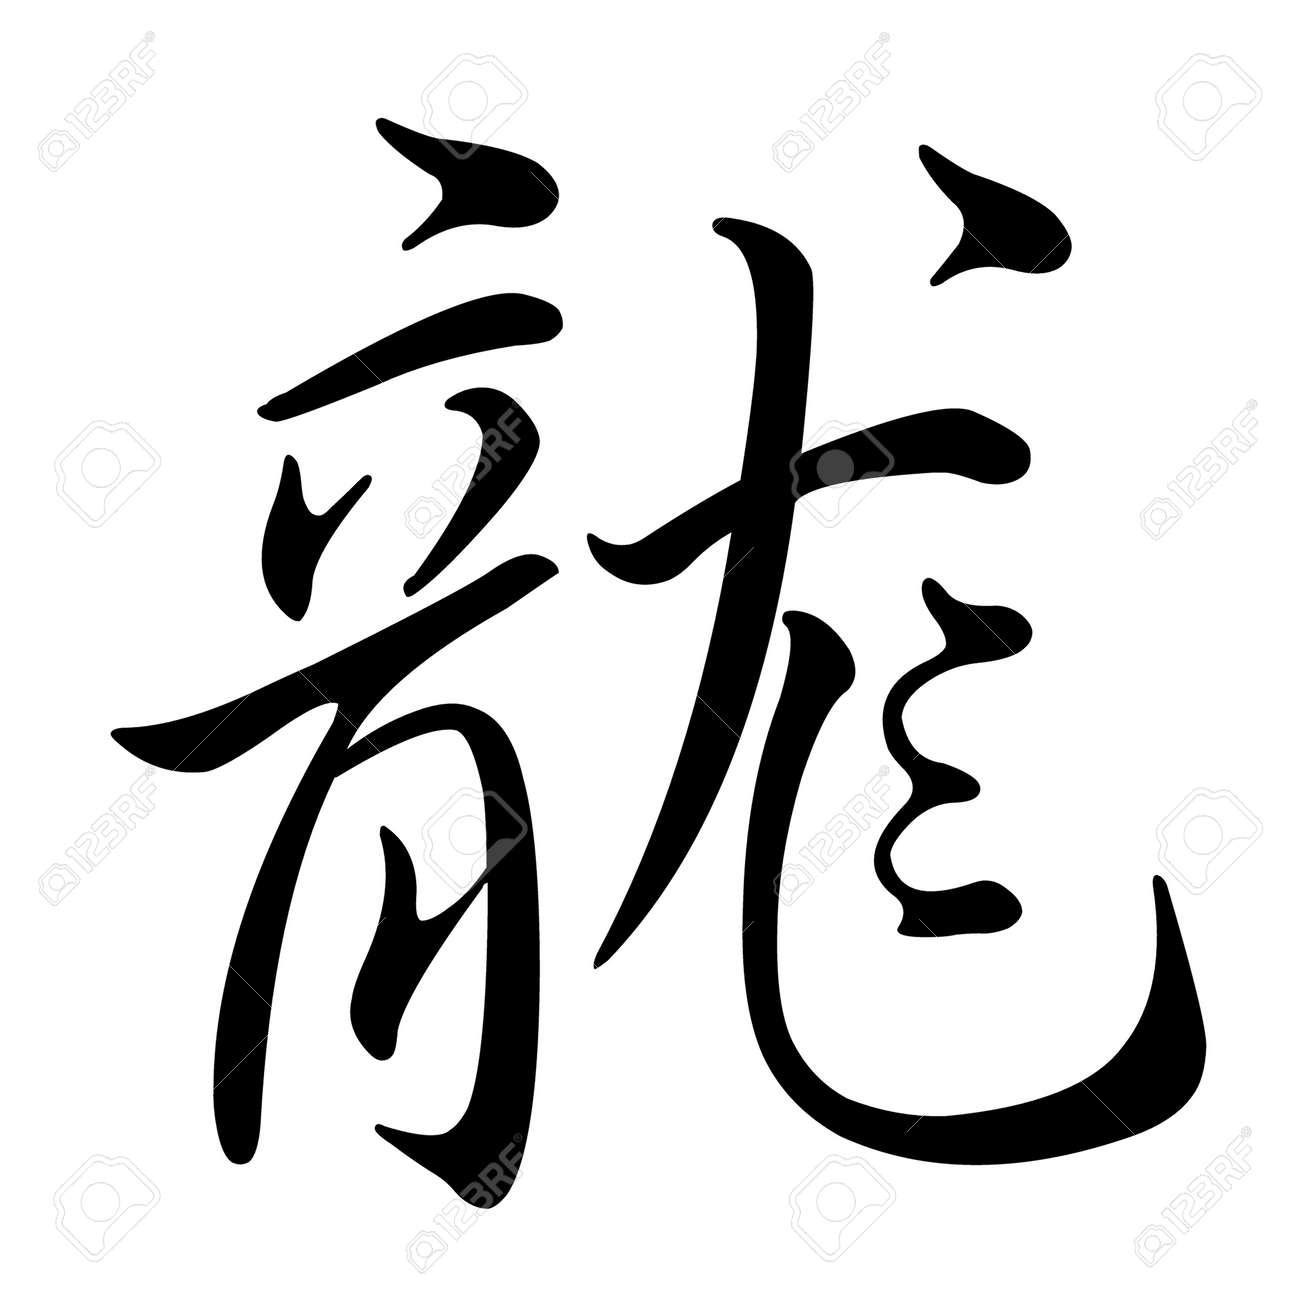 Chinese Zodiac Symbols Dragon Bigking Keywords And Pictures